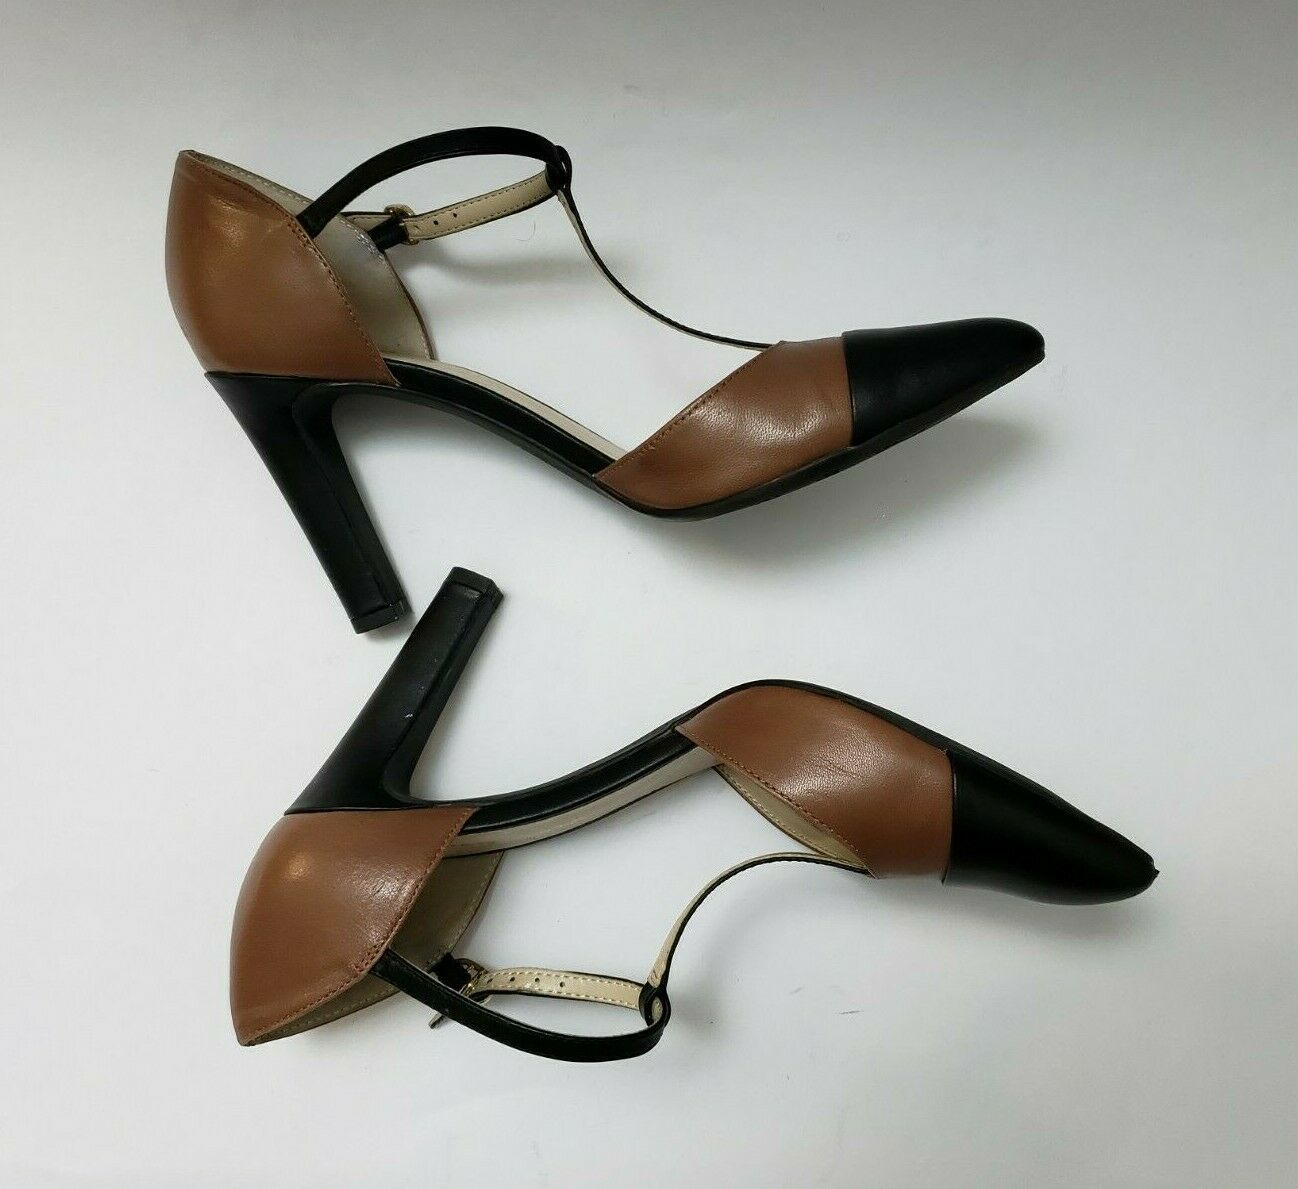 Franco Sarto Shoes Heels Brown Black T-Strap Tanda Womens Size 8.5 M image 9